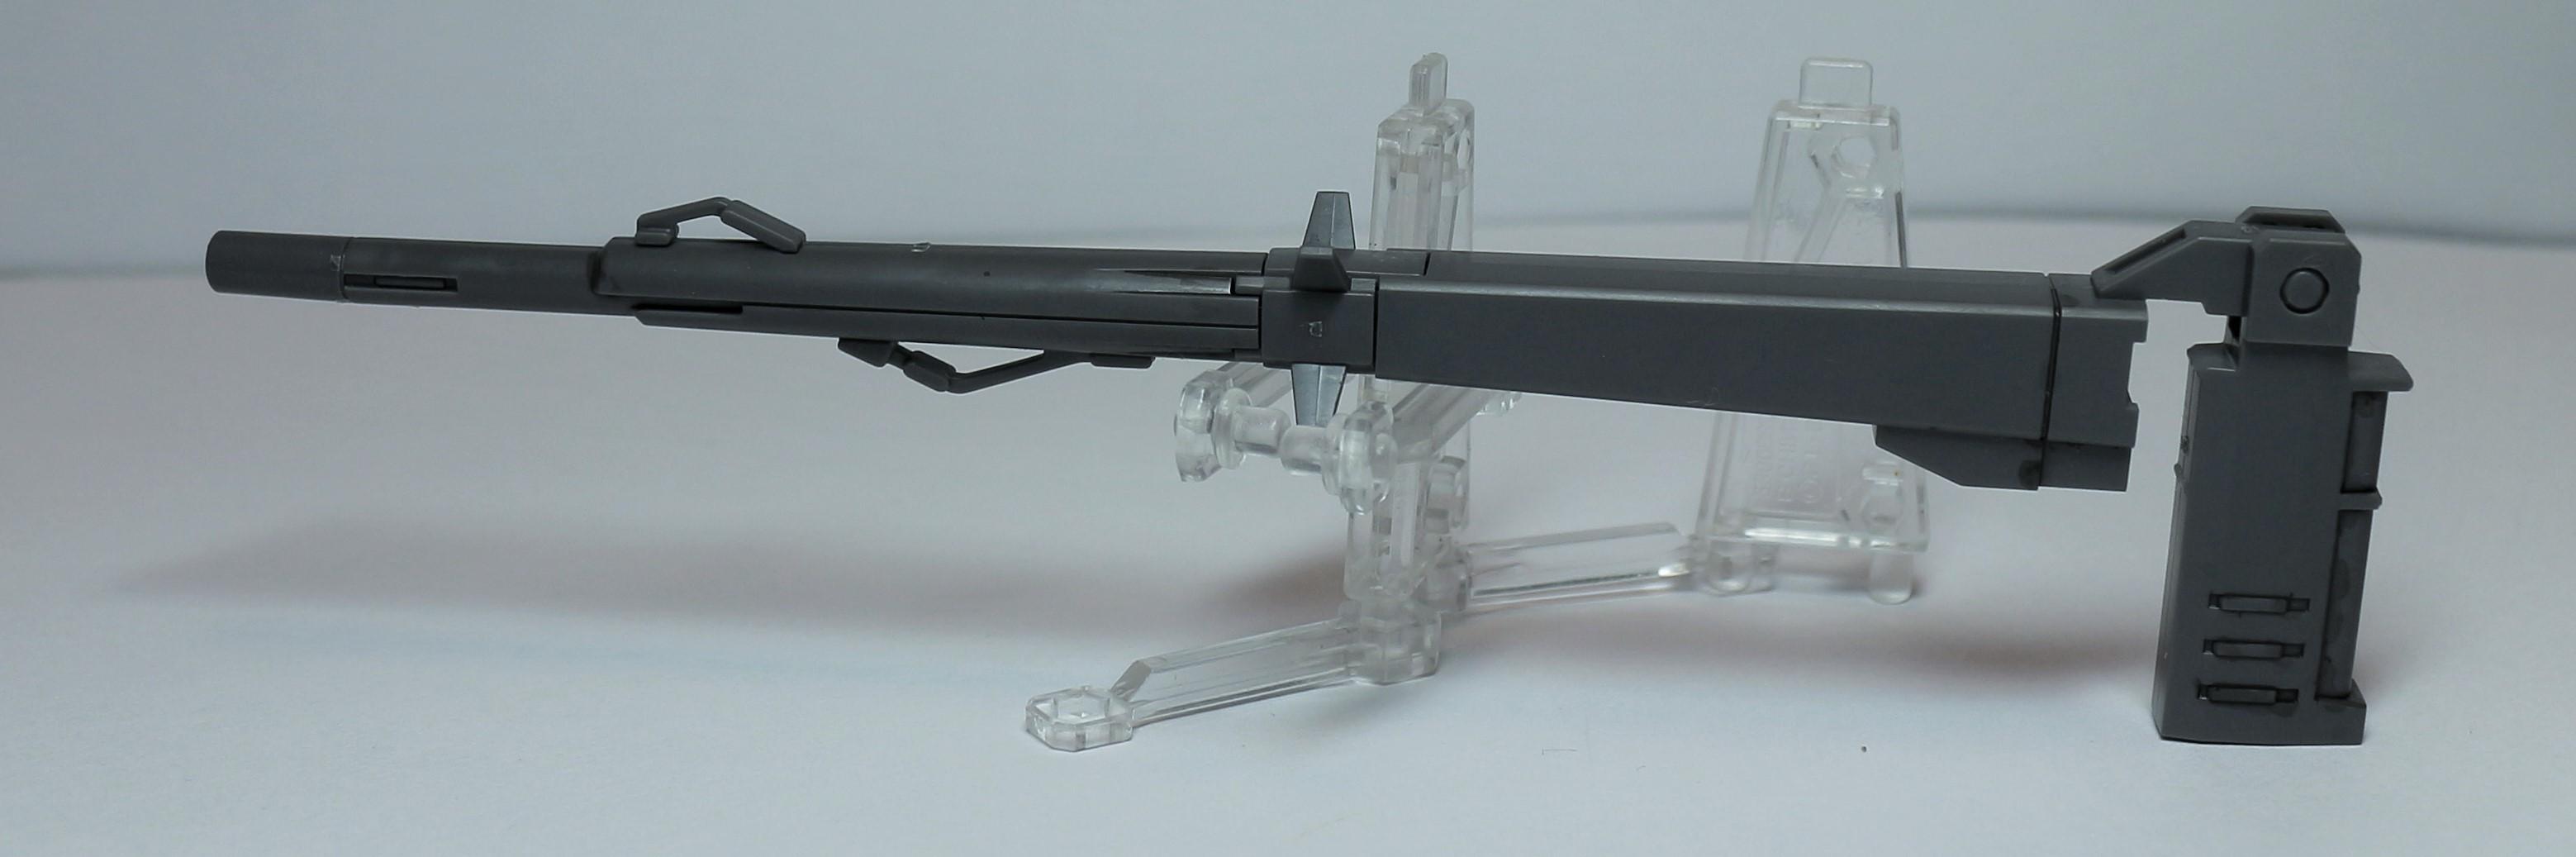 MG-CrossBone_X2_Custom-147.jpg